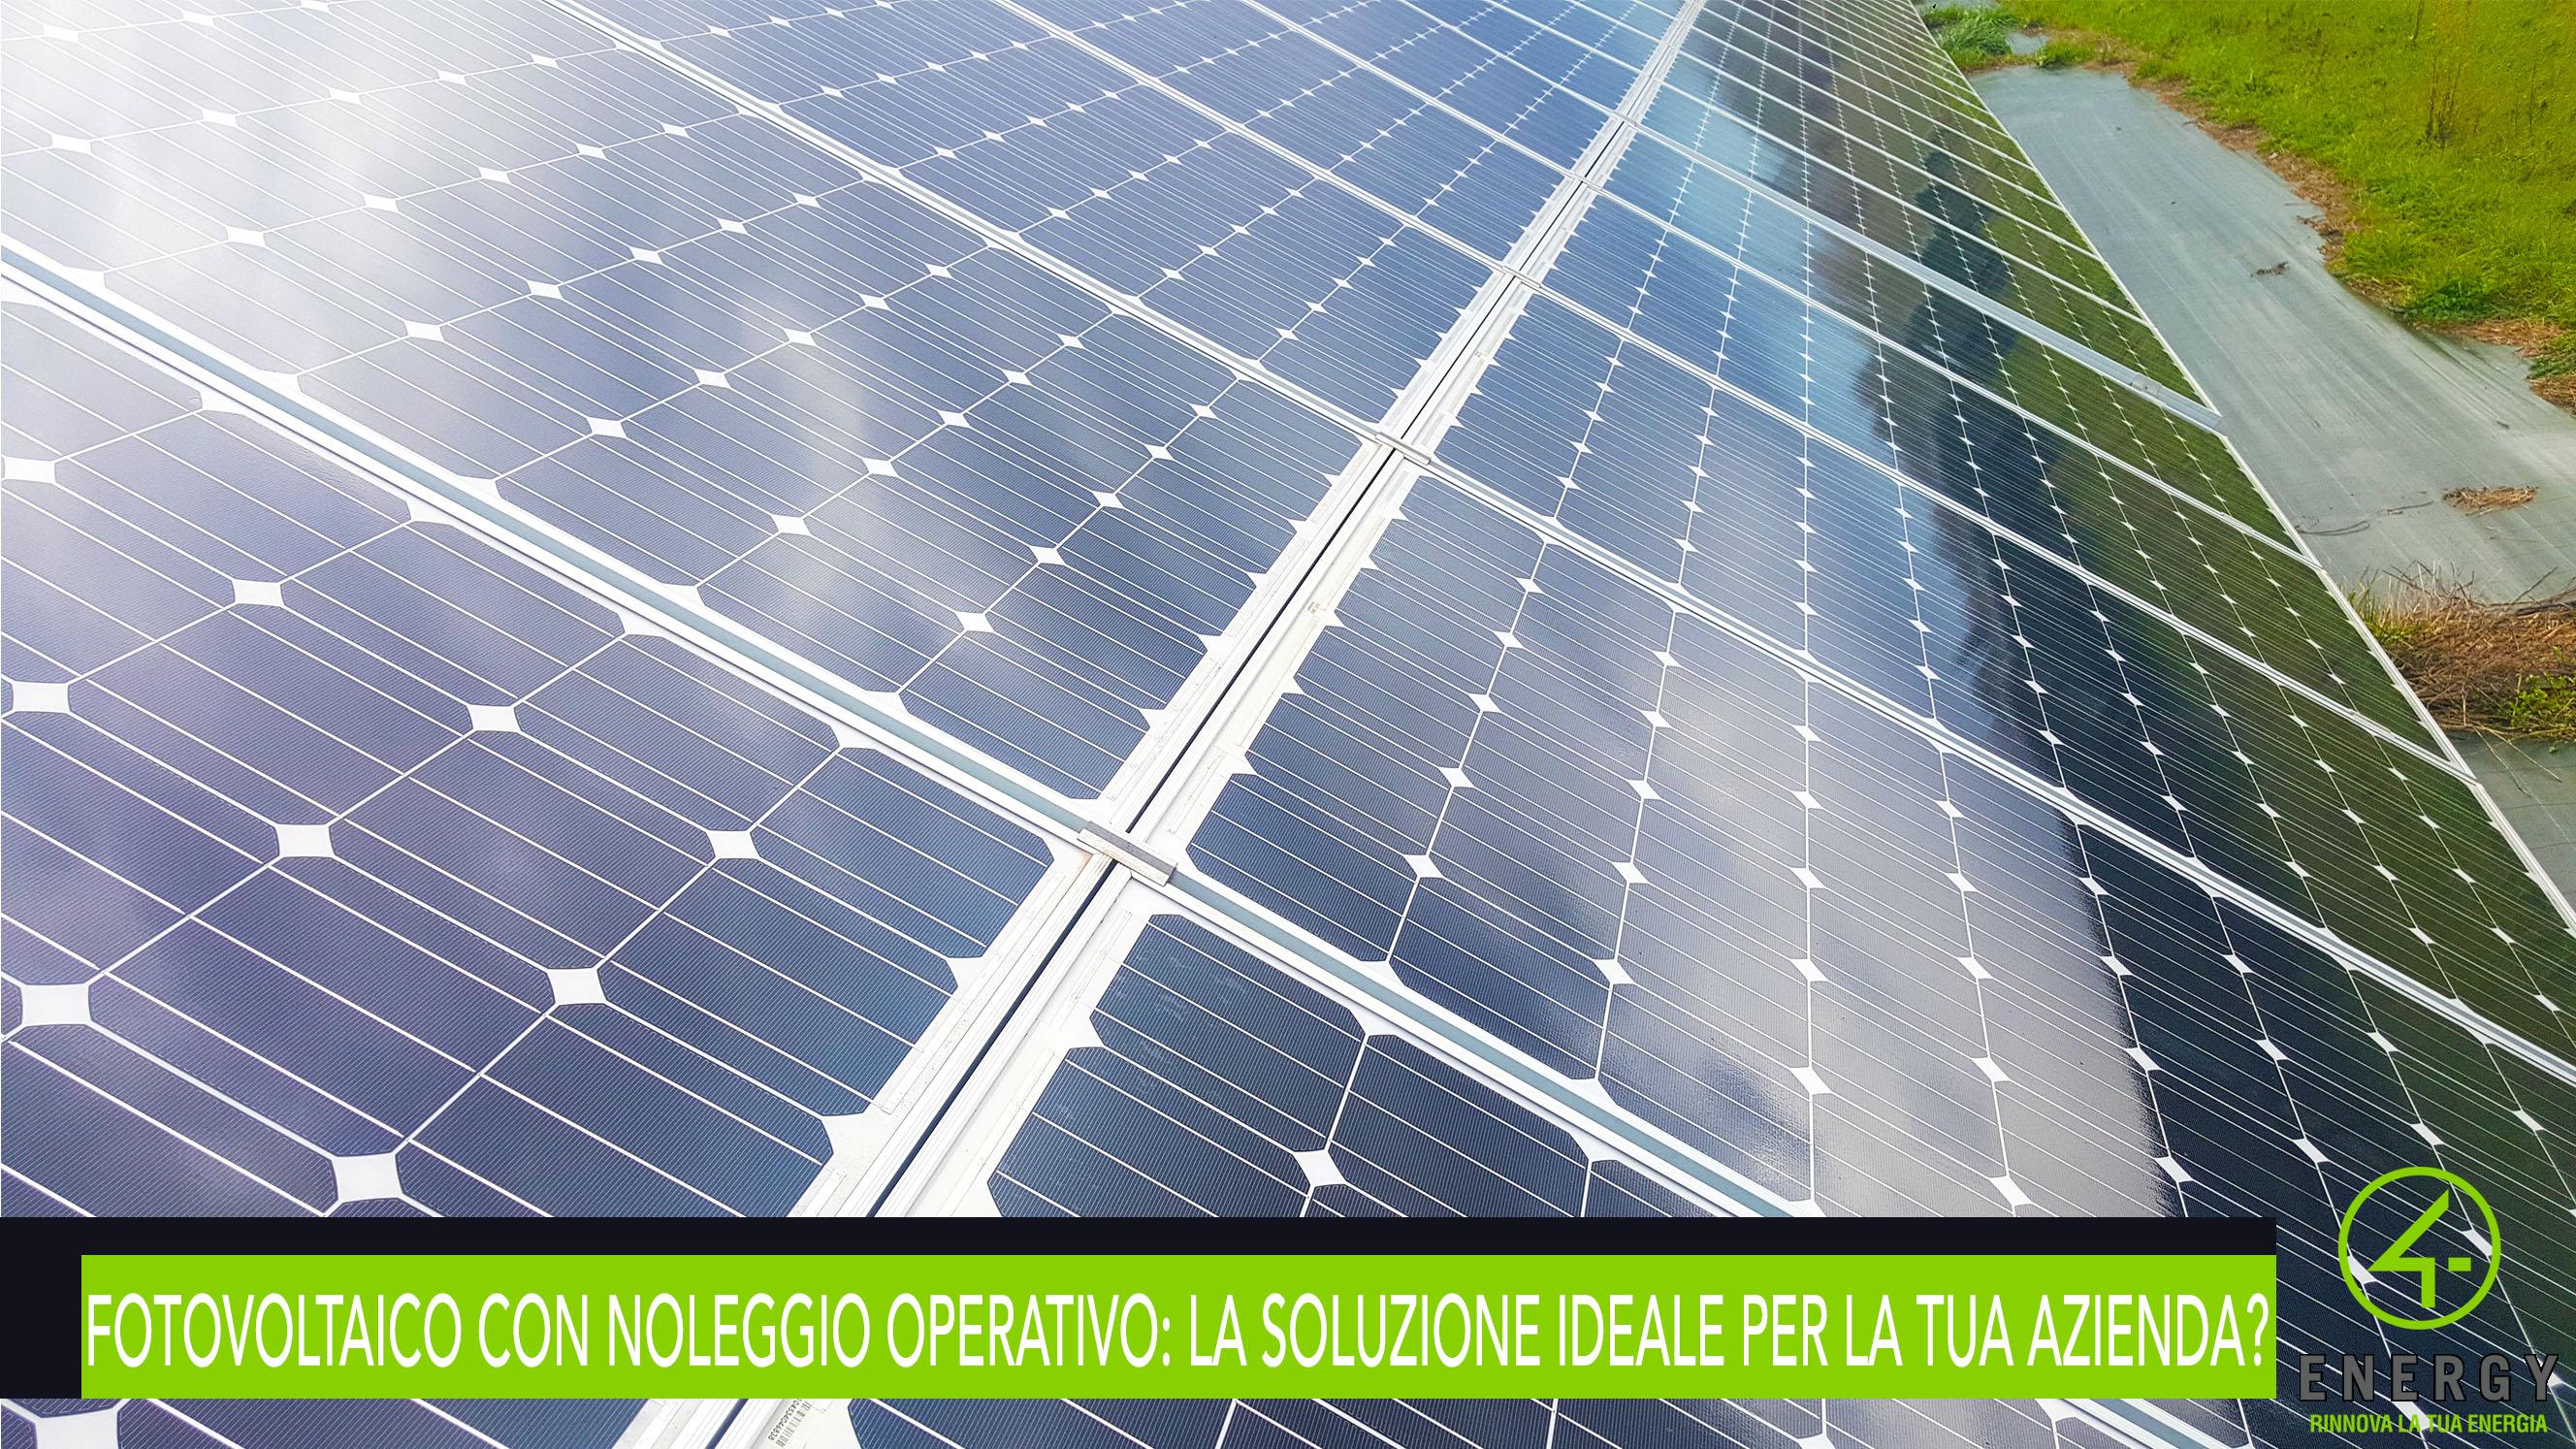 fotovoltaico noleggio operativo